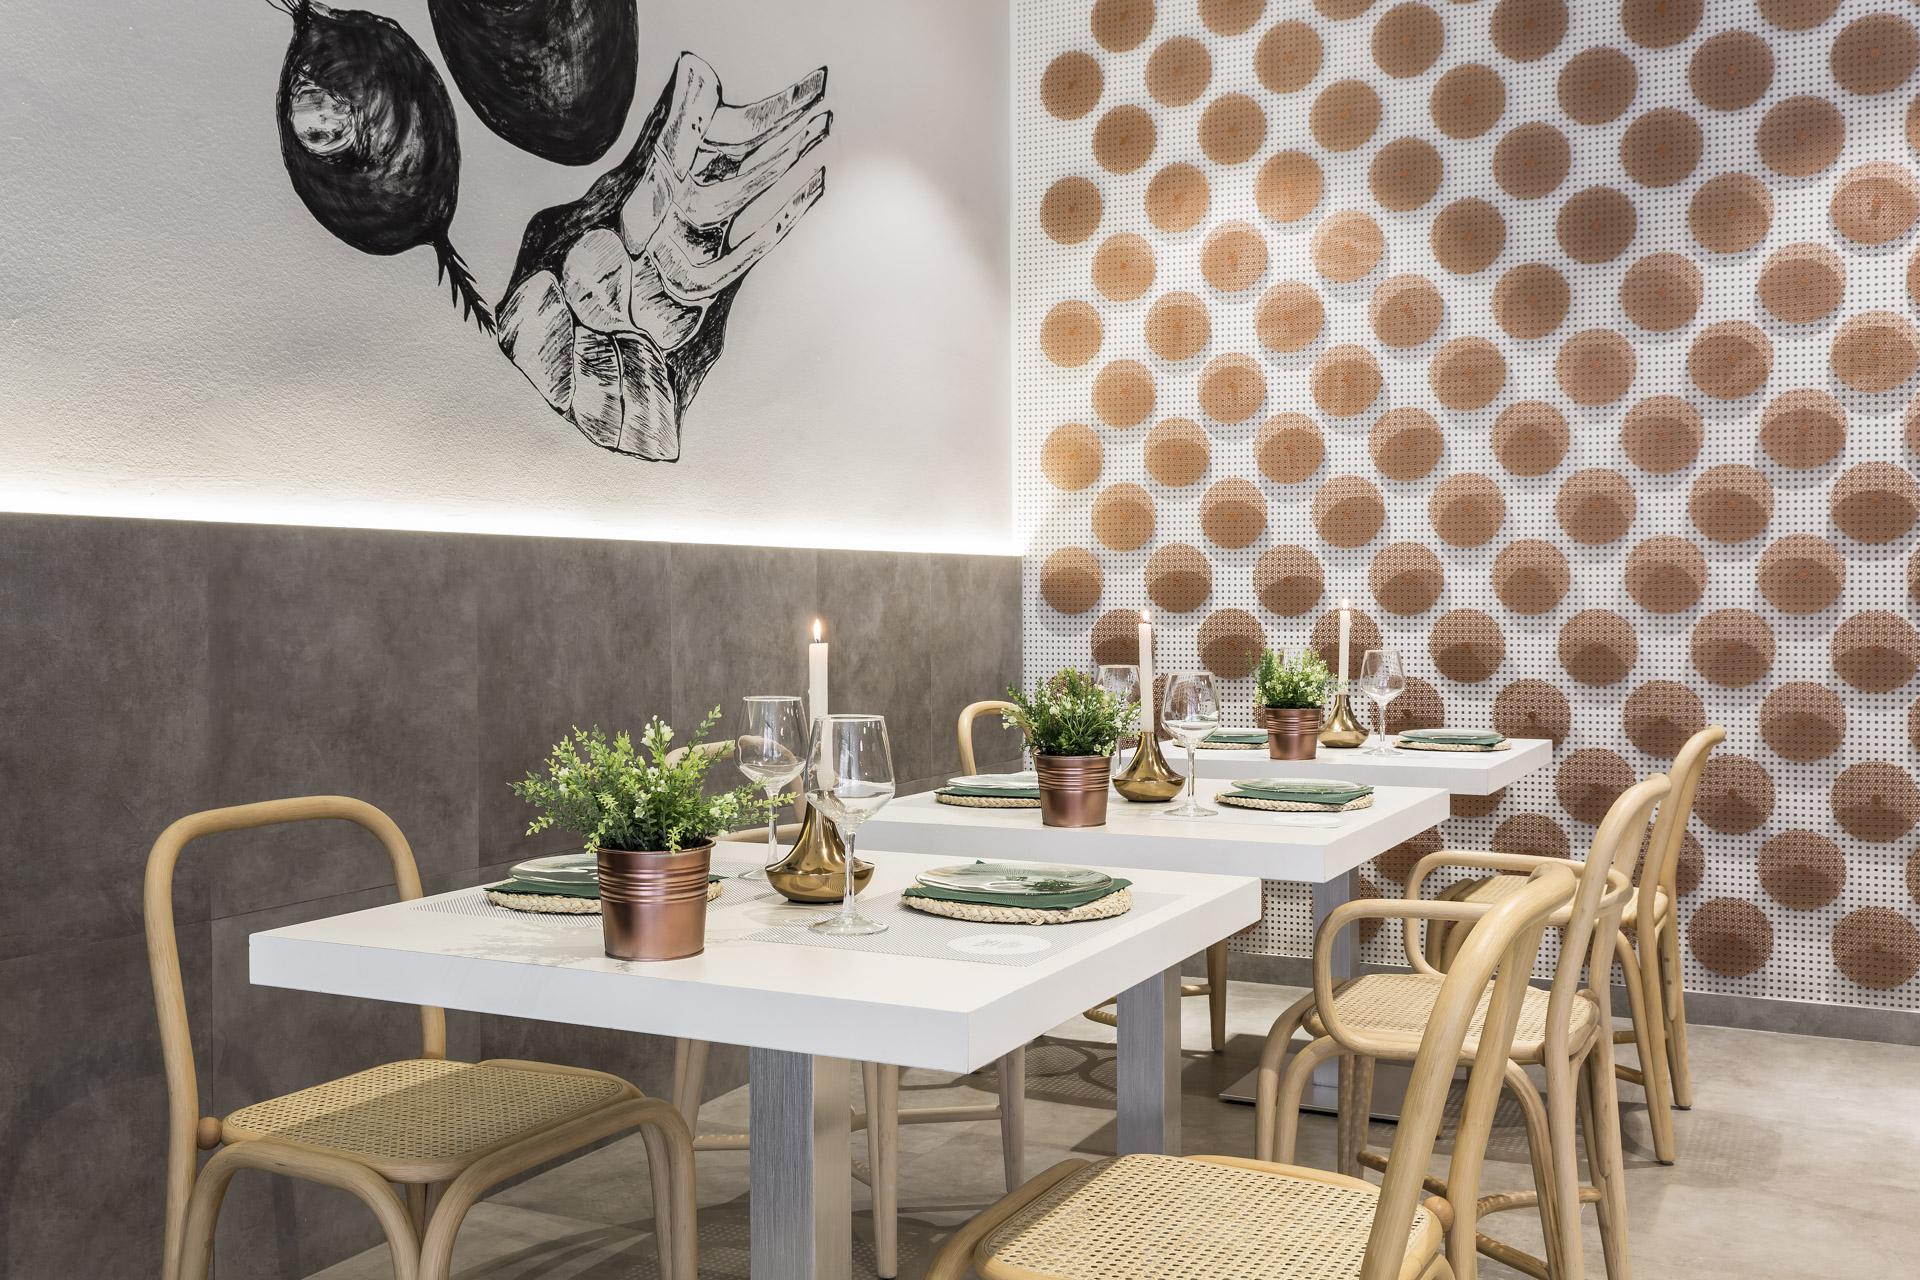 fotografia-arquitectura-valencia-german-cabo-estudihac-restaurante-nac-ontinyent-16